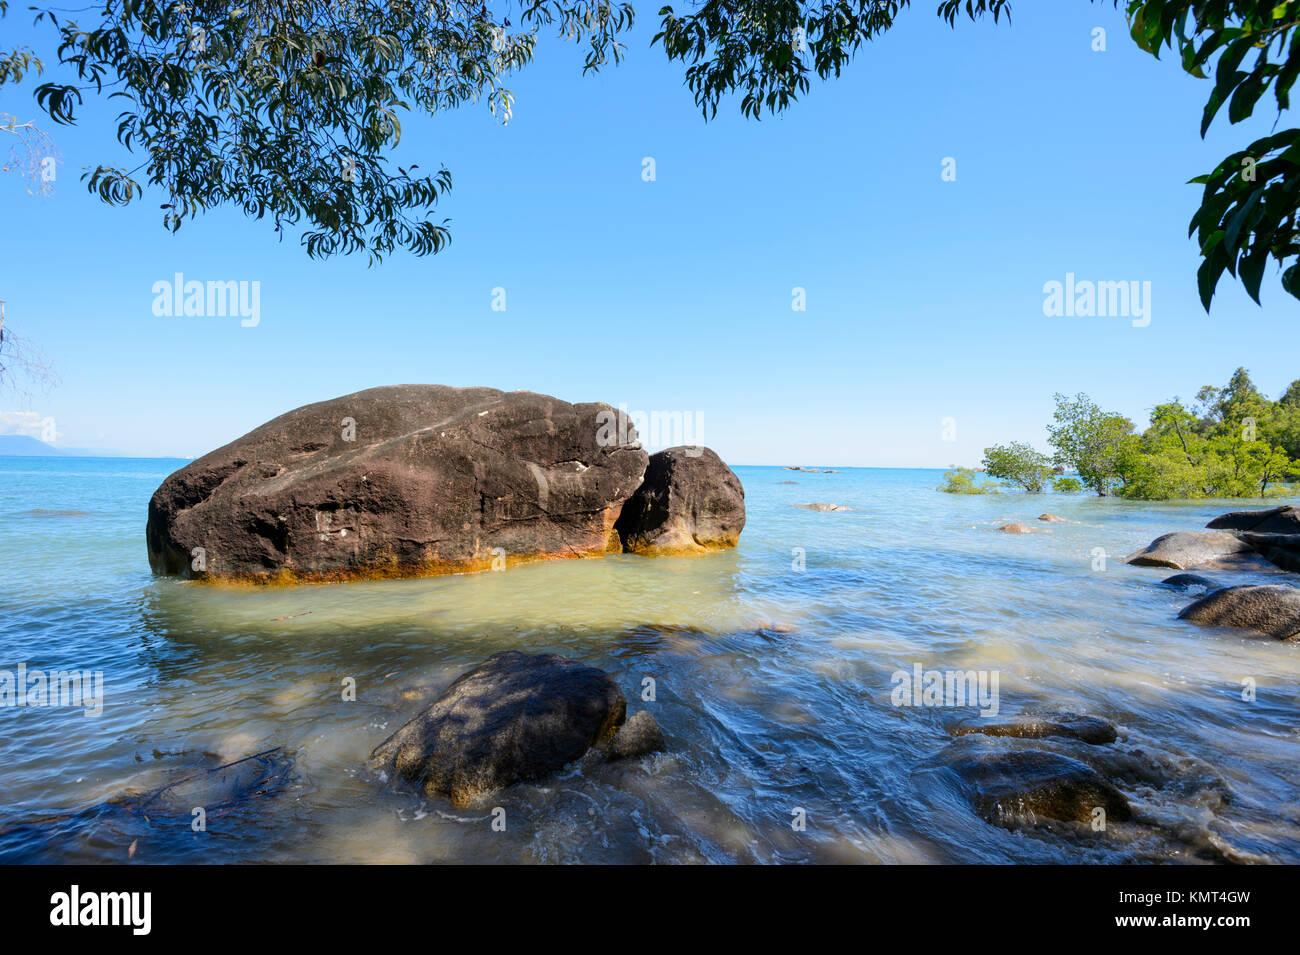 Scenic coastline at Yarrabah, Aboriginal Shire, near Cairns, Far North Queensland, FNQ, QLD, Australia Stock Photo